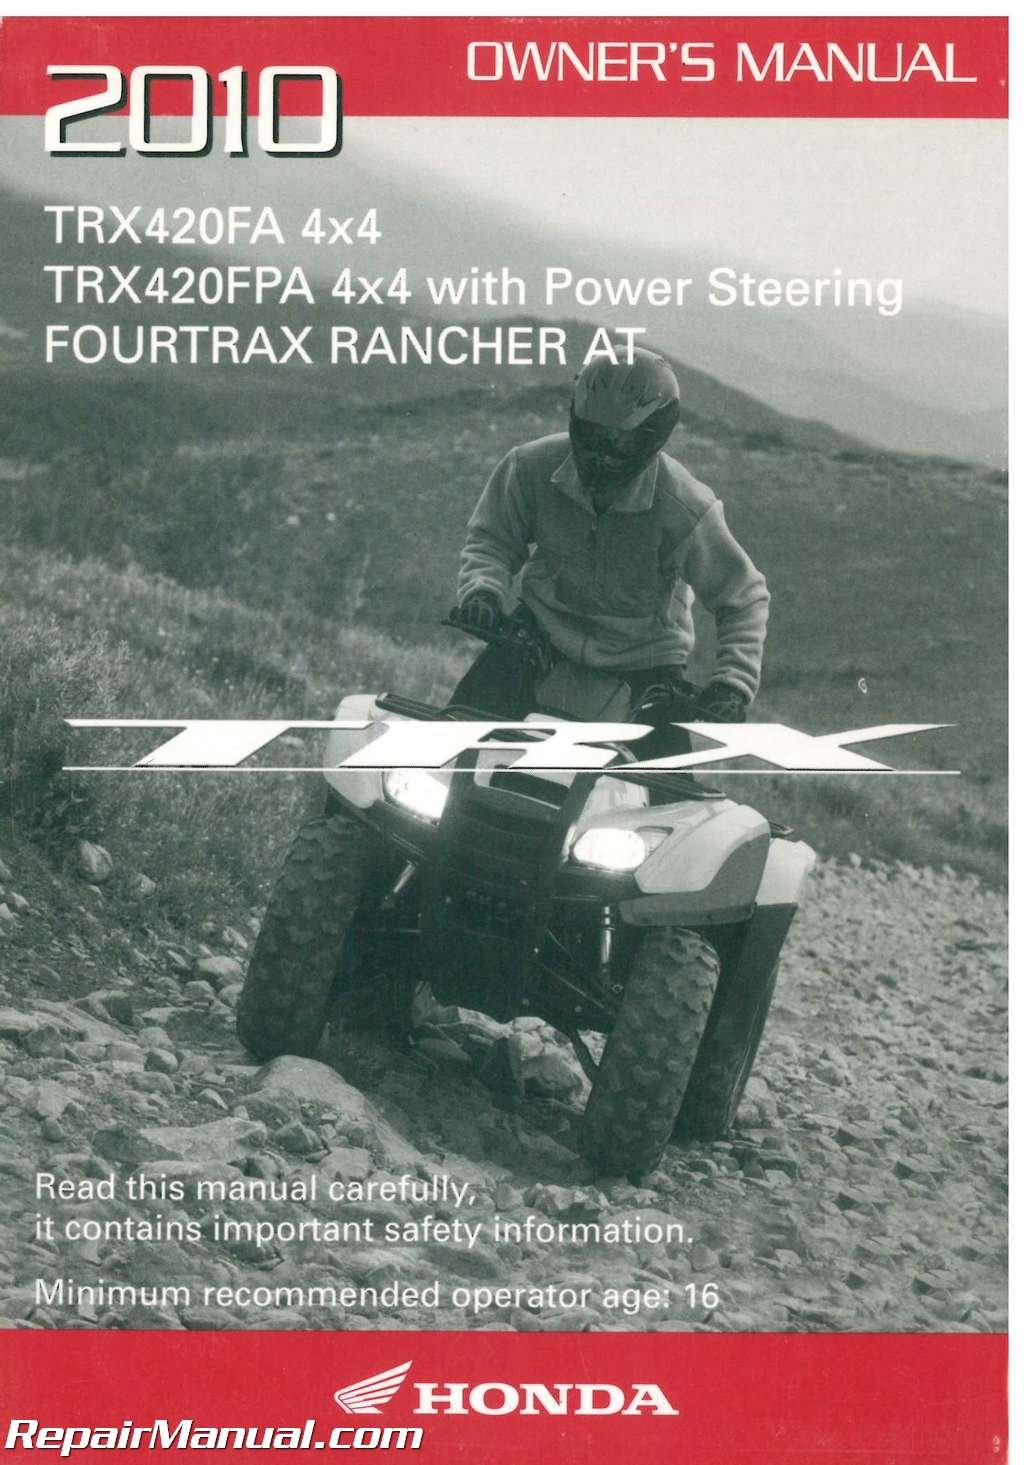 Genuine Honda ATV Owners Manual 2013 TRX420FA TRX420FPA Rancher AT